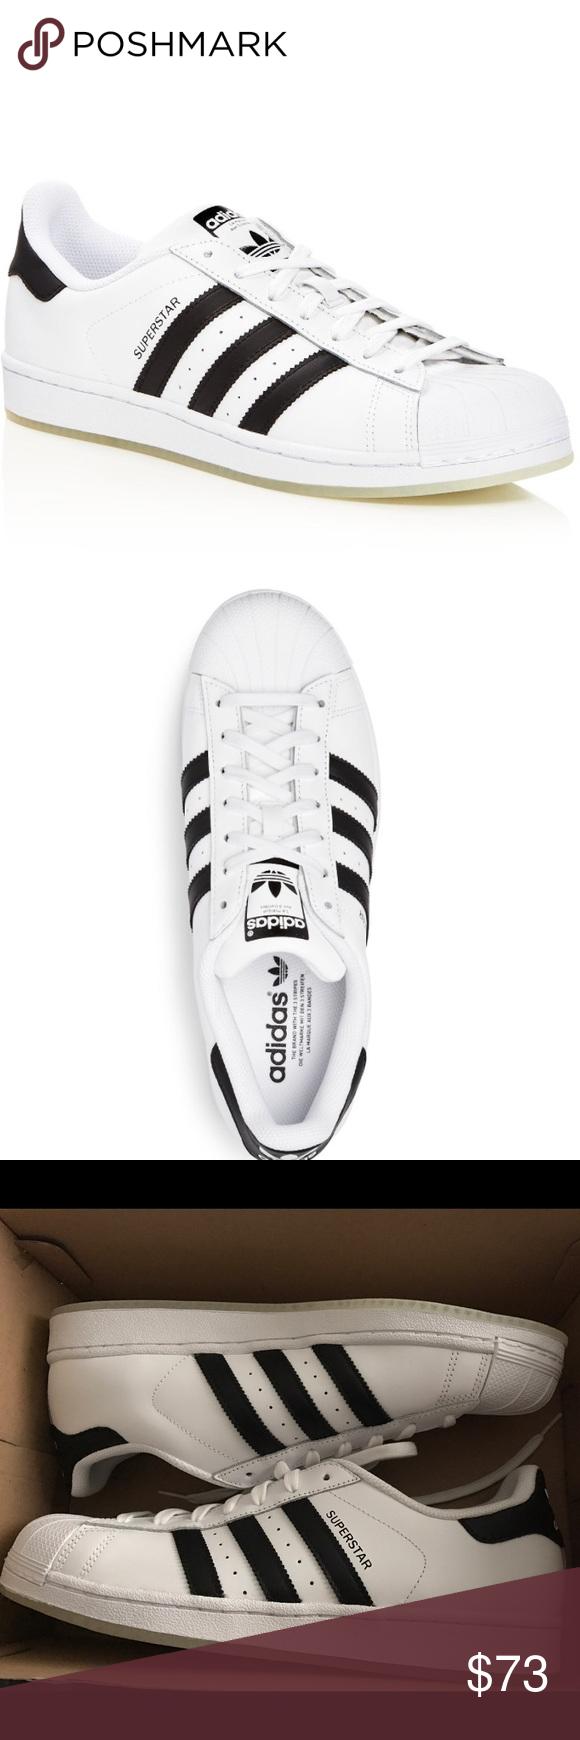 ADIDAS Superstar Men\u0027s Fashion Sneaker White/Black Brand new Adidas Men\u0027s  Superstars! Always trendy